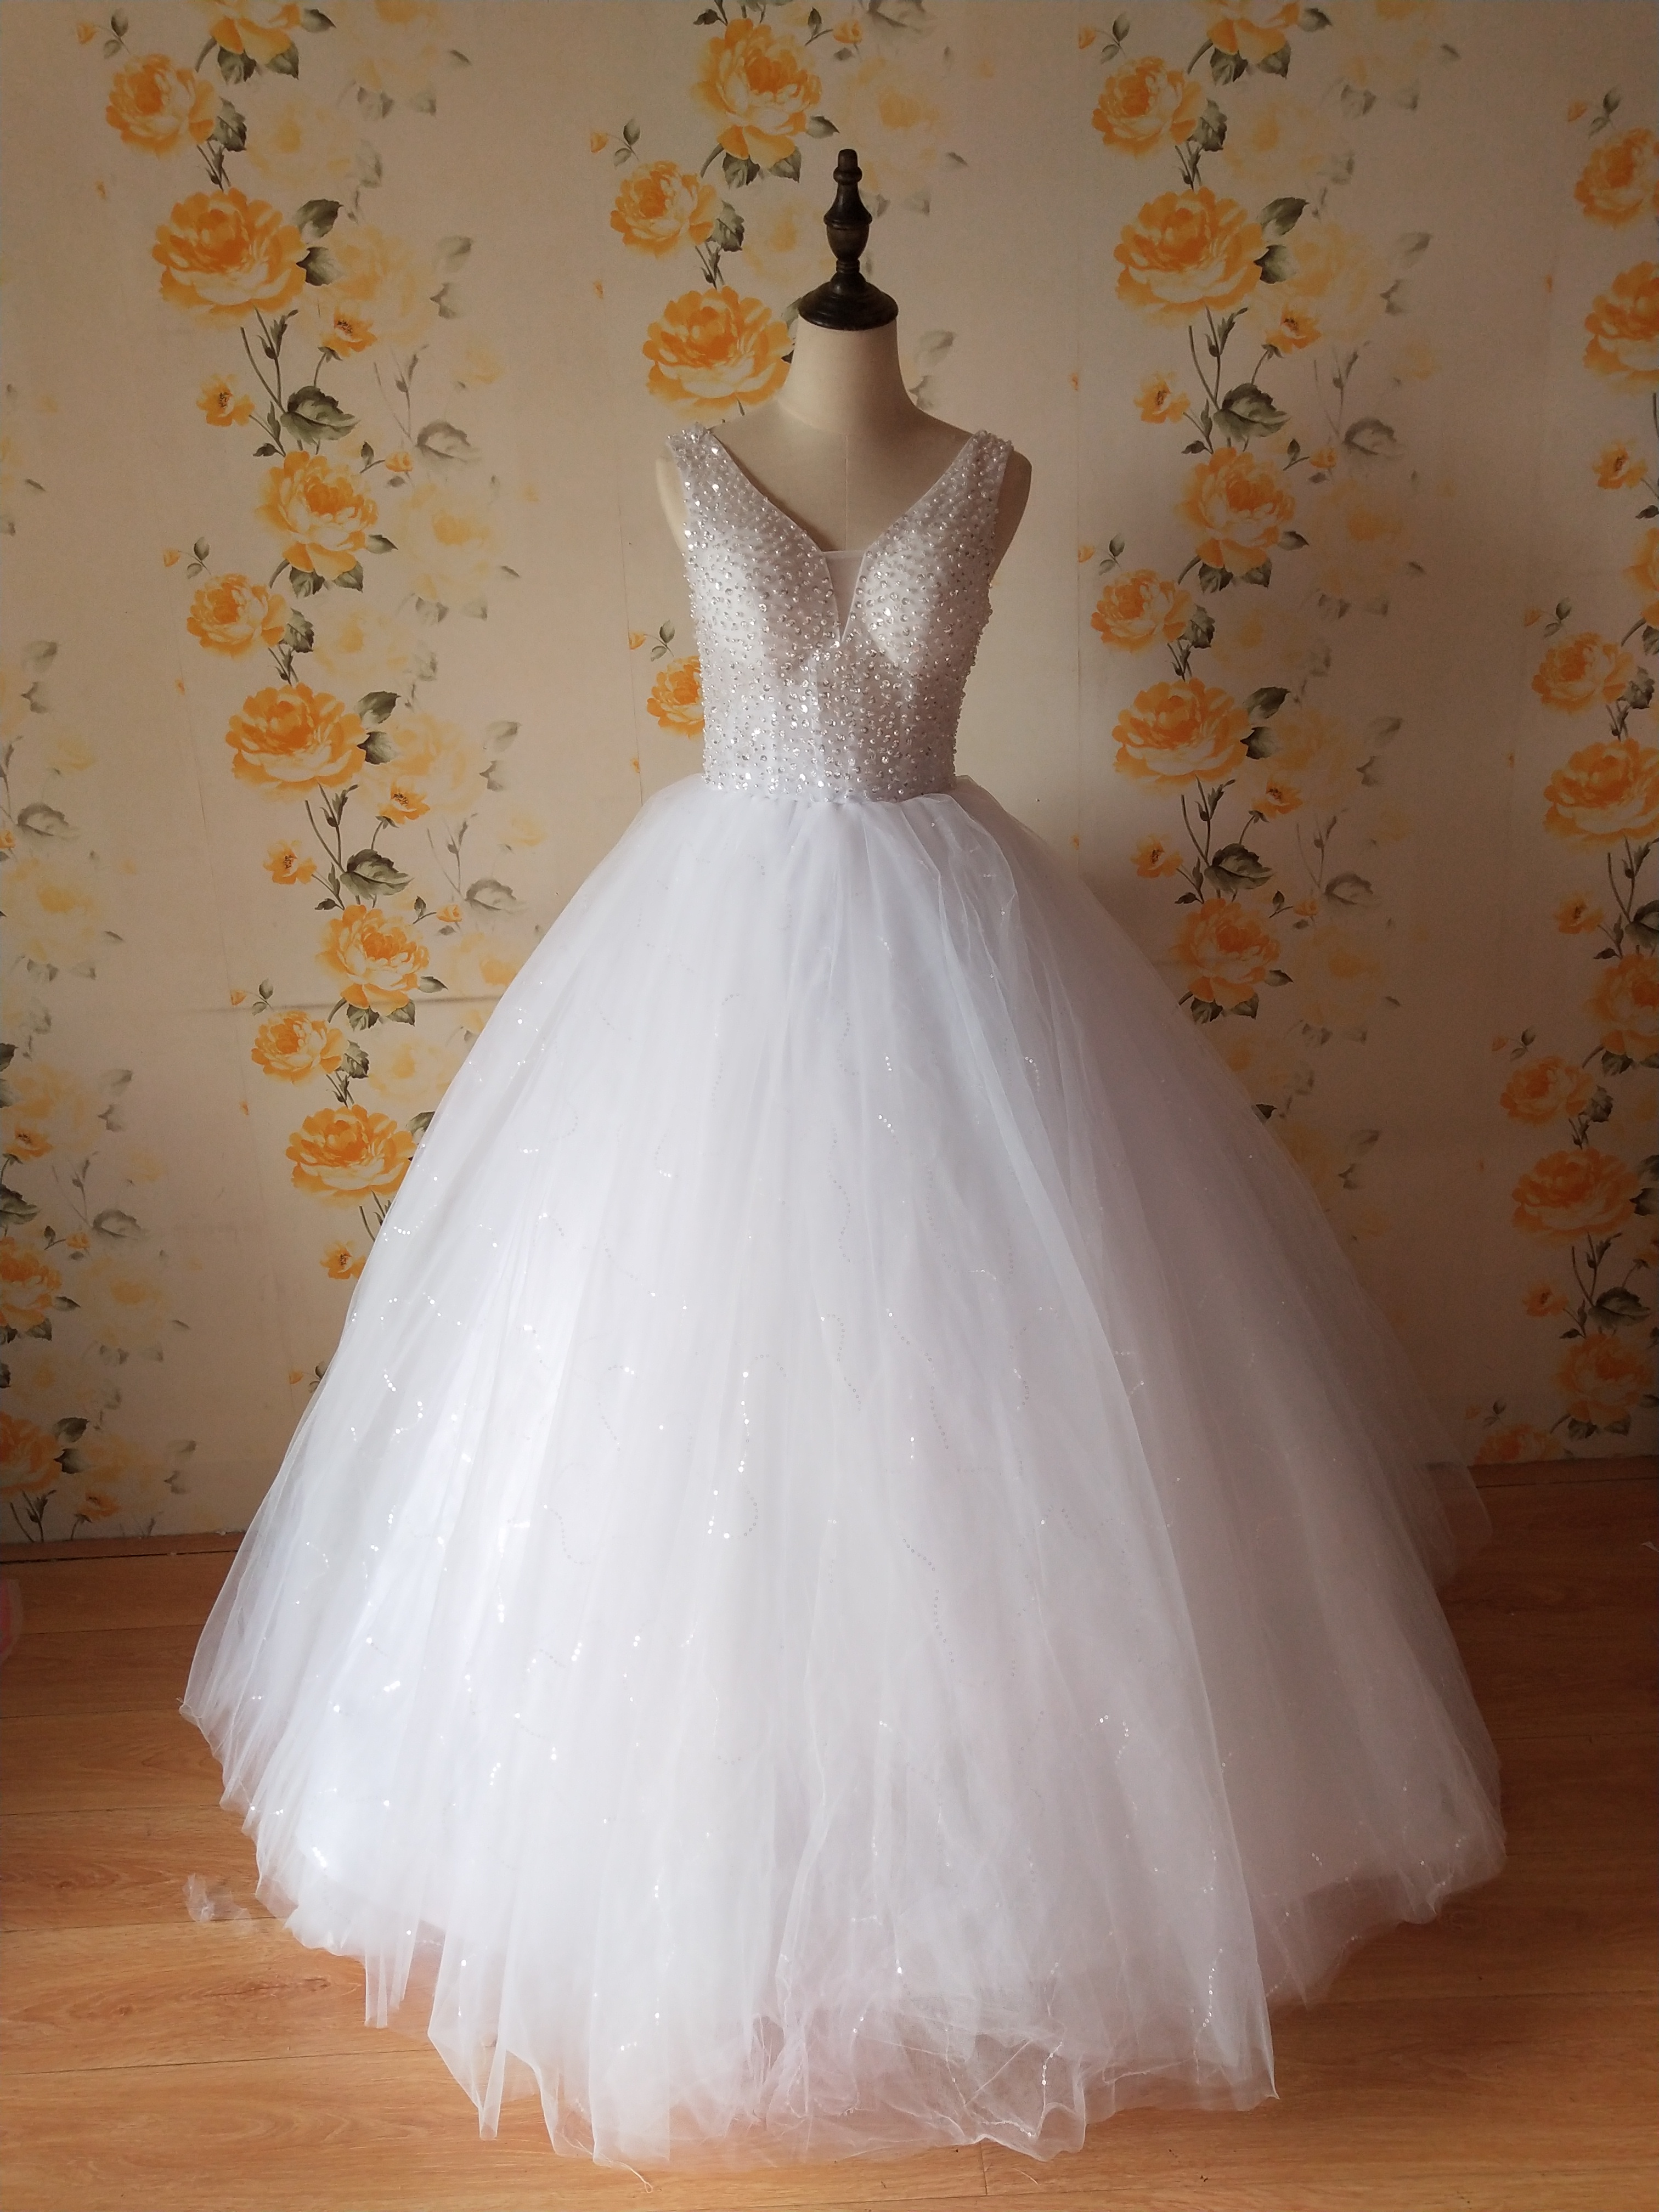 ZJ9098 2020 2019 New White Ivory Elegant O Neck Wedding Dresses For Brides Bottom Lace Customer Made